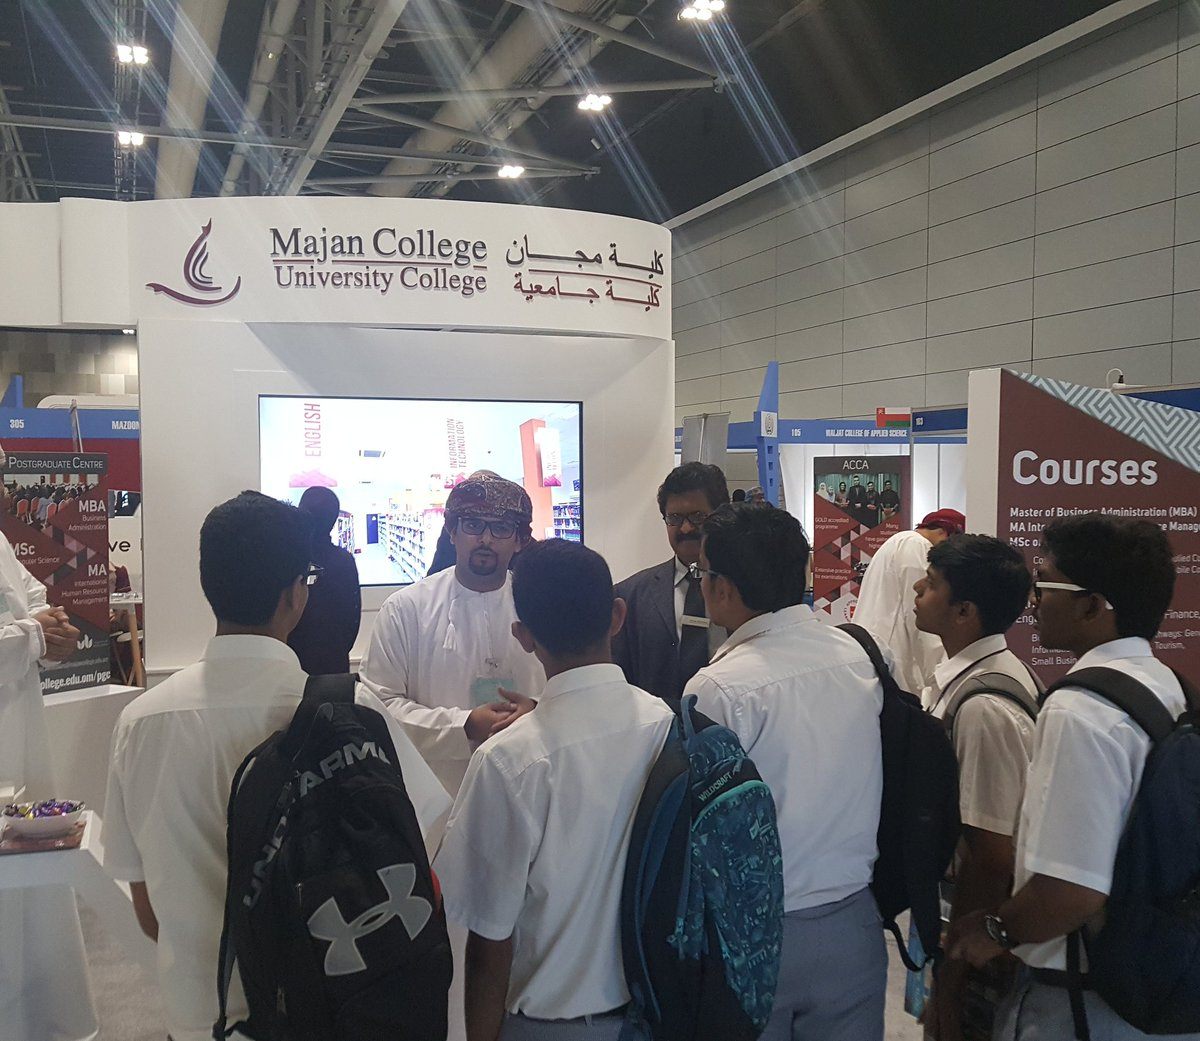 Majan College (@Majan_College) | Twitter